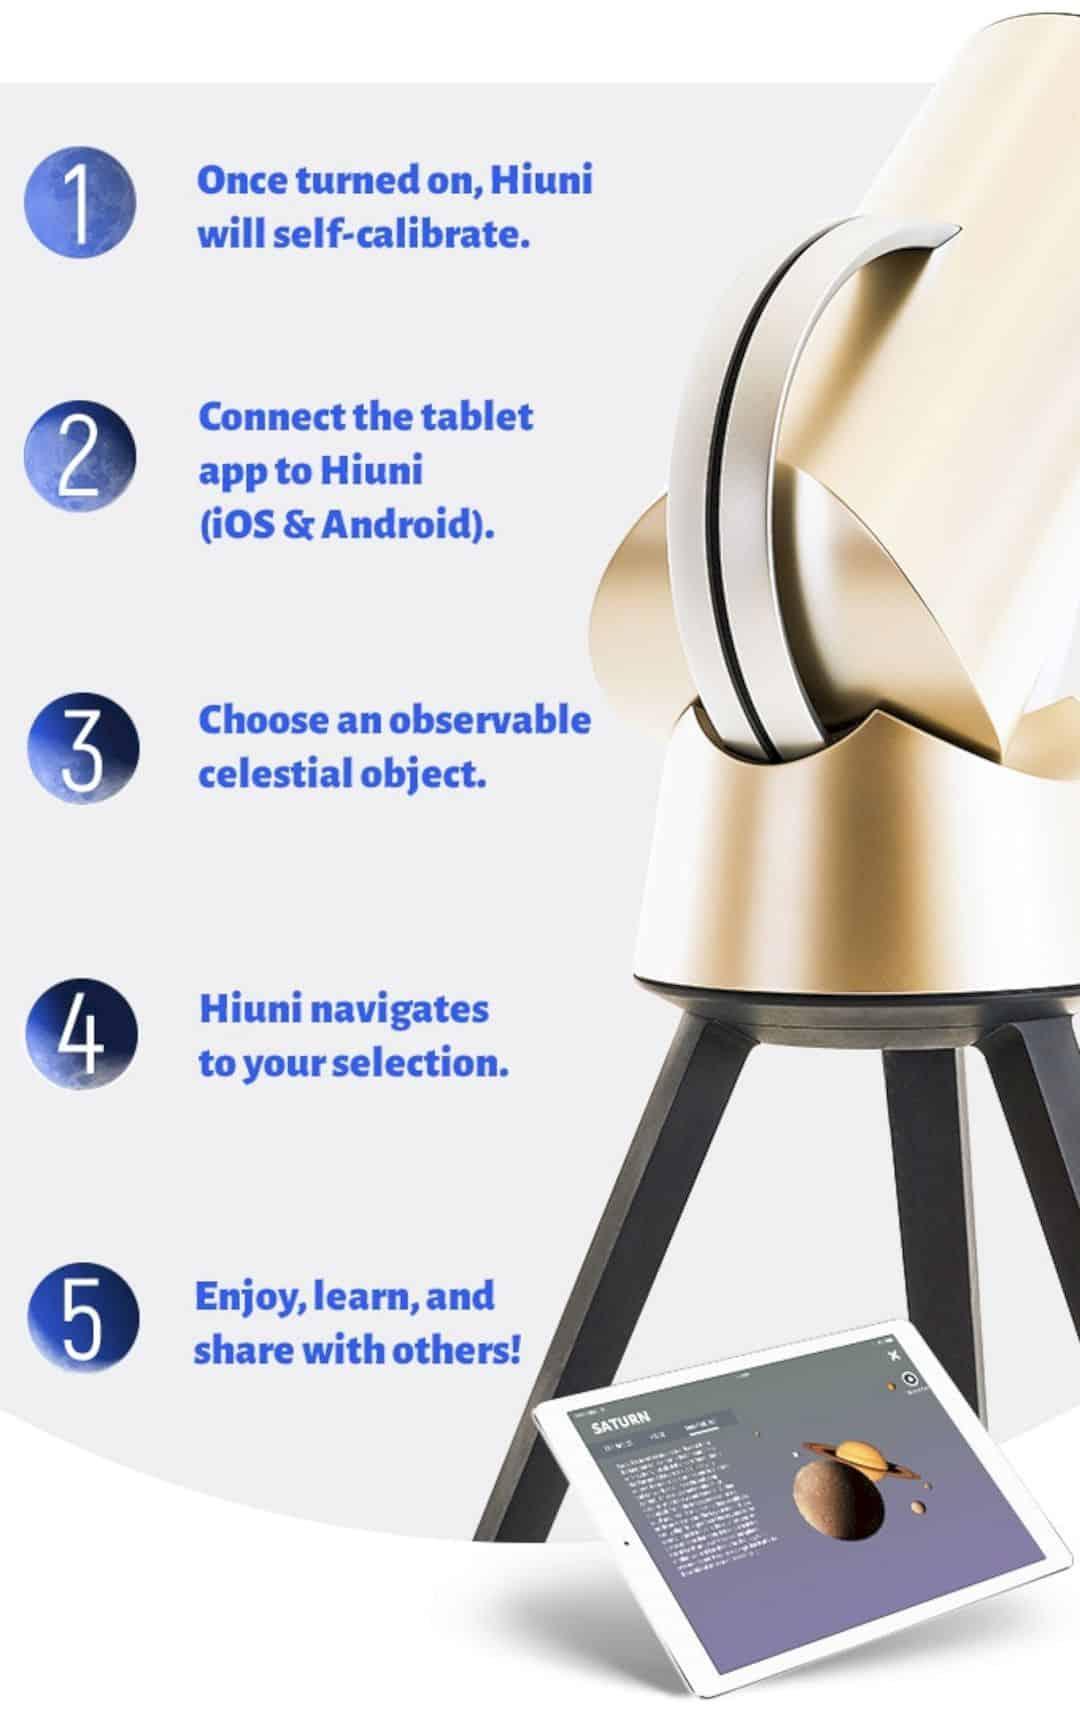 Hiuni Smart Telescope 4